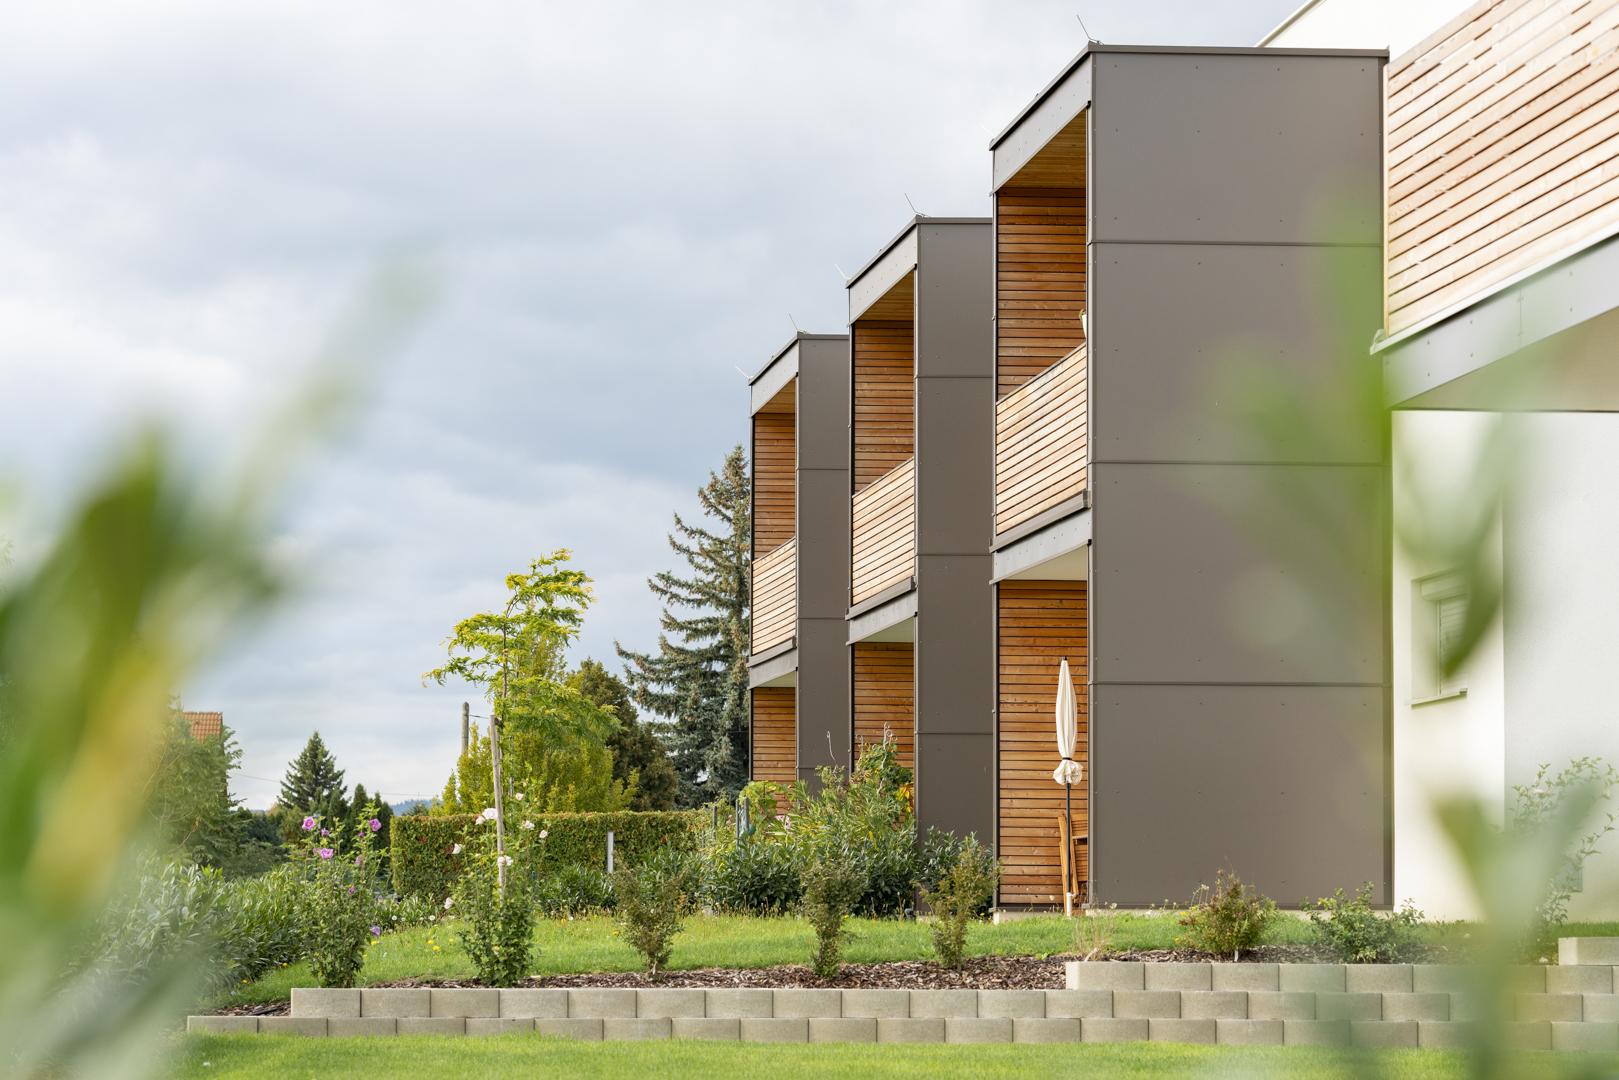 Architekturfotografie Pflegezentrum Neubau von Fotograf Michael Pinzolits